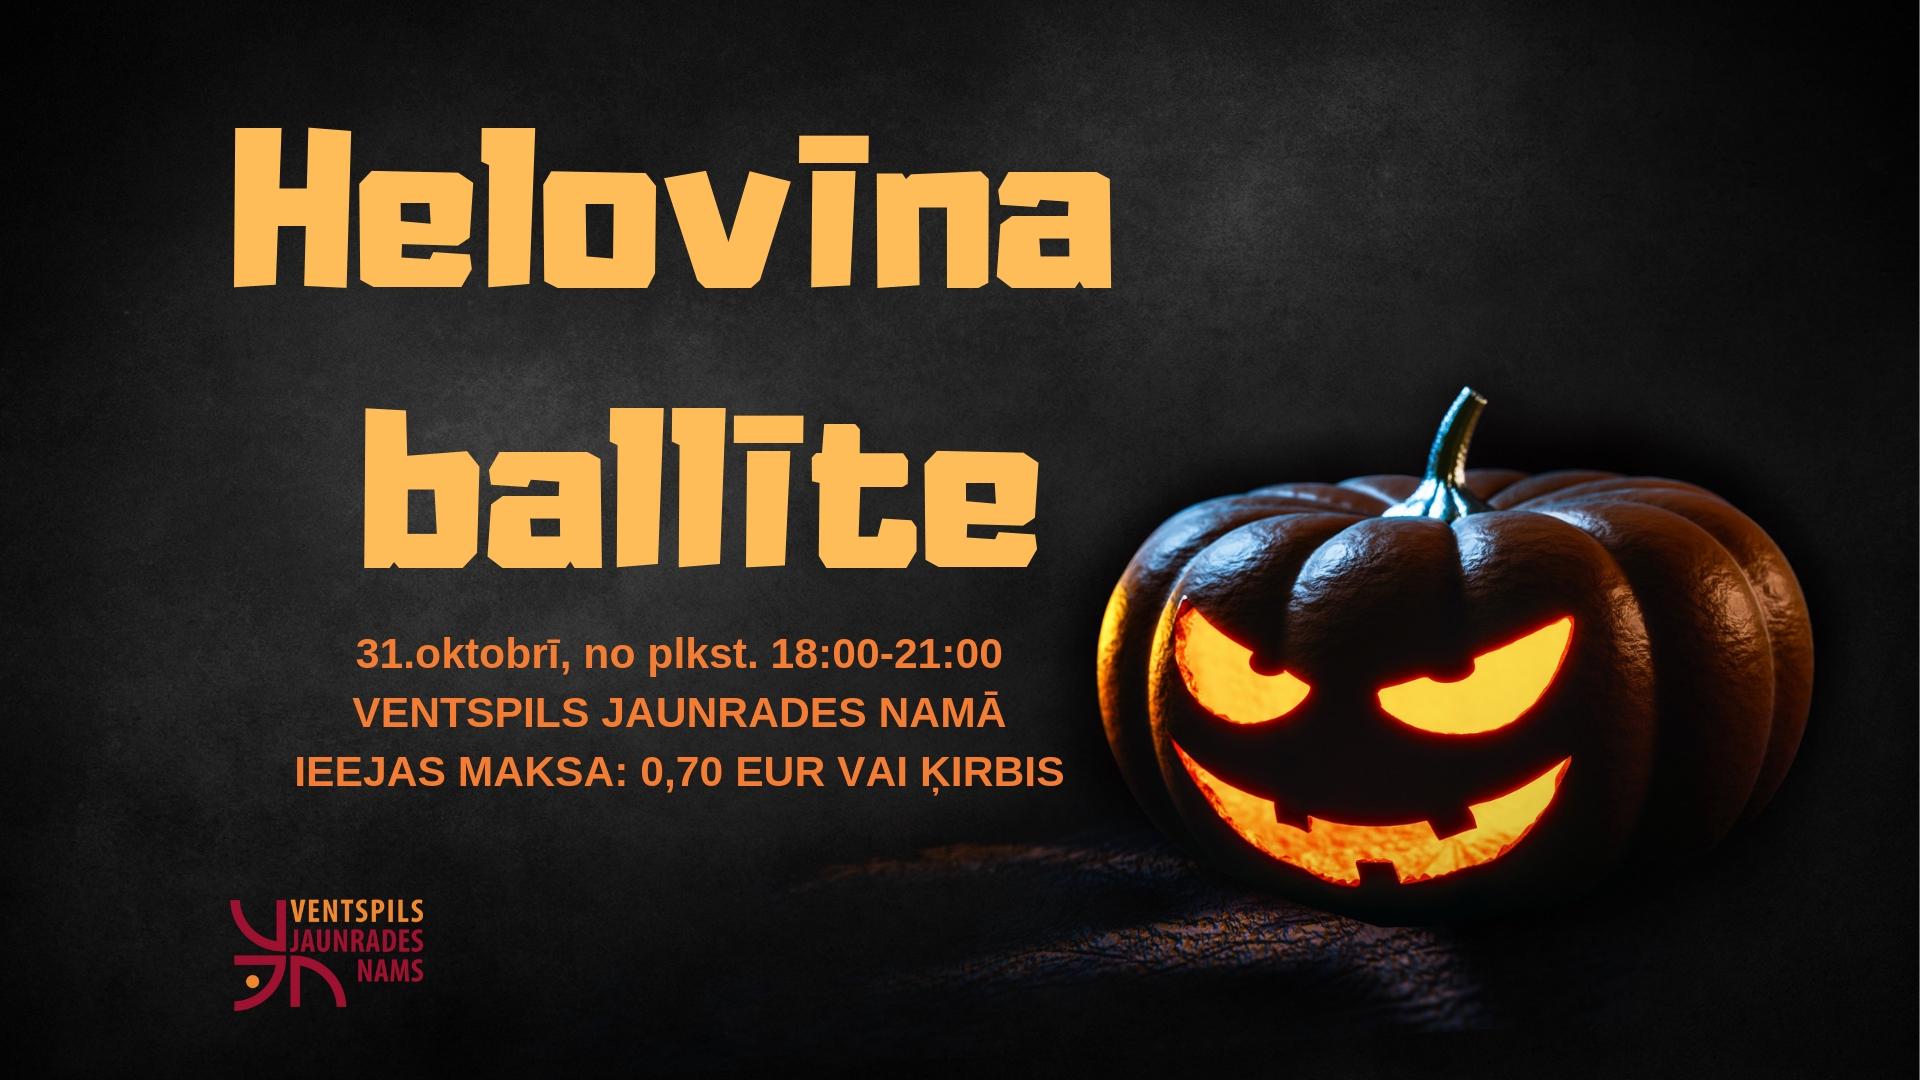 Helovīna_ballīte